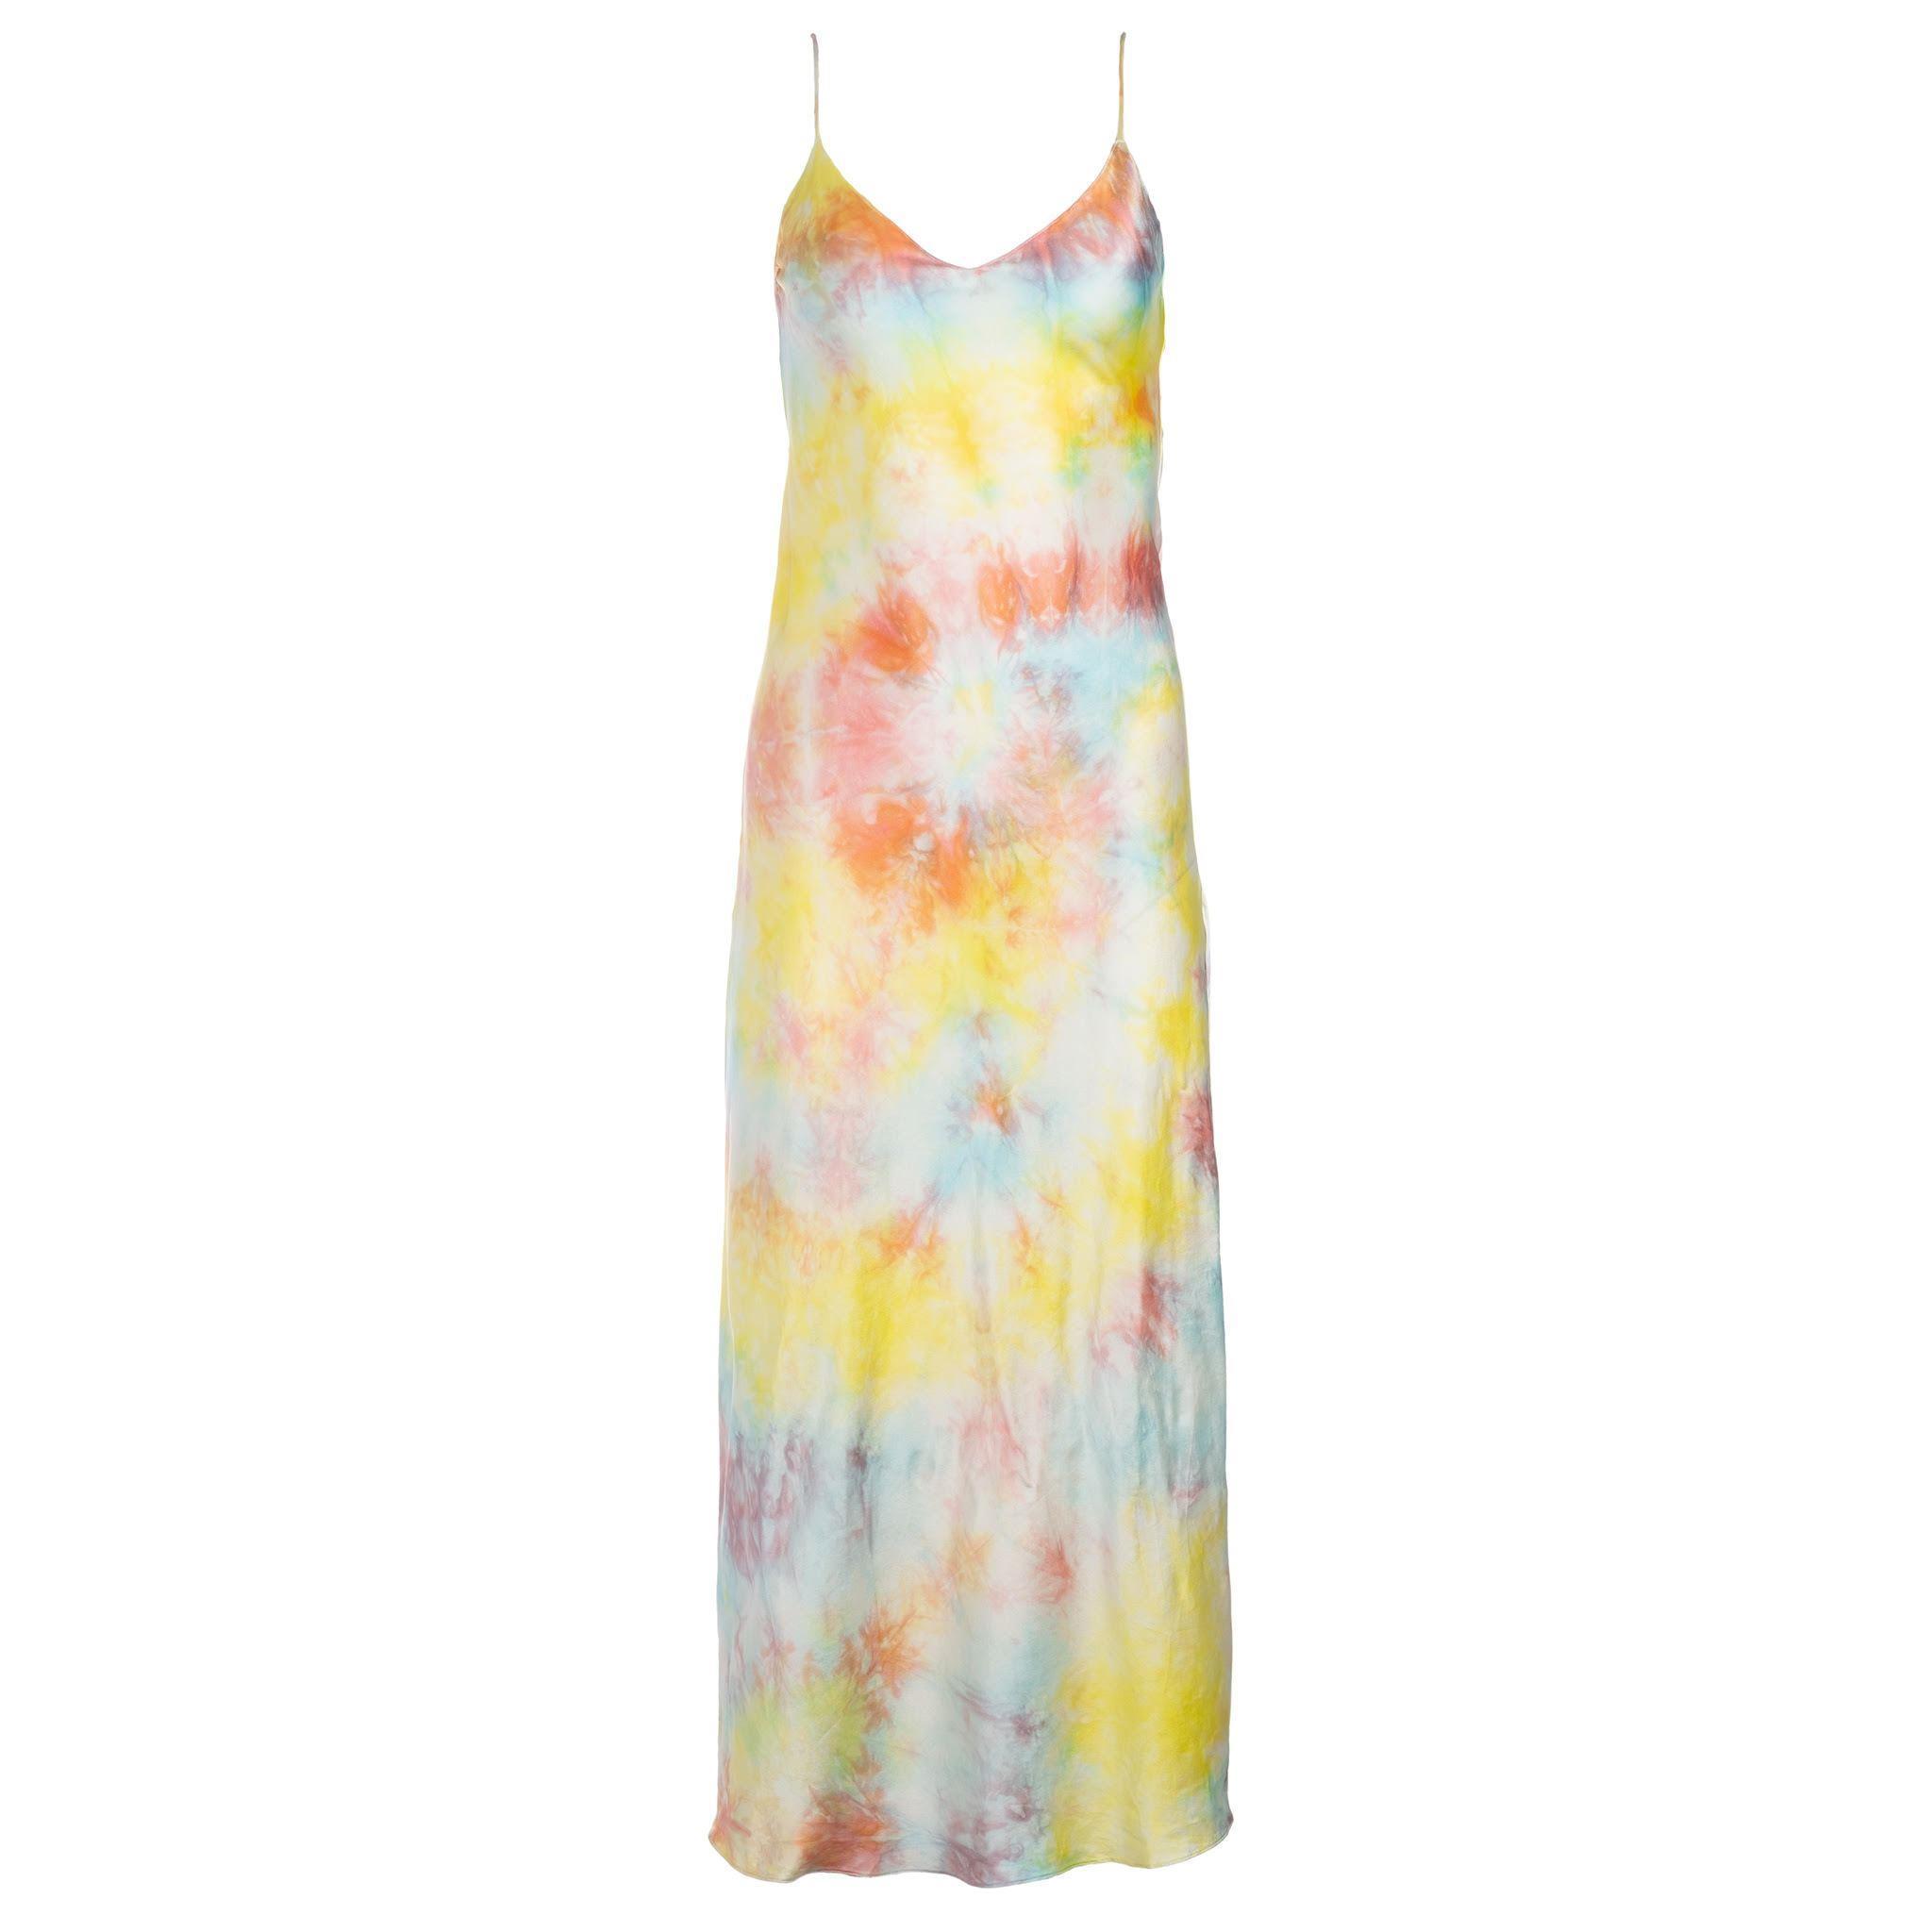 Dannijo Tie Dye Silk Slip Dress with Slide-Slit - 90s Redux